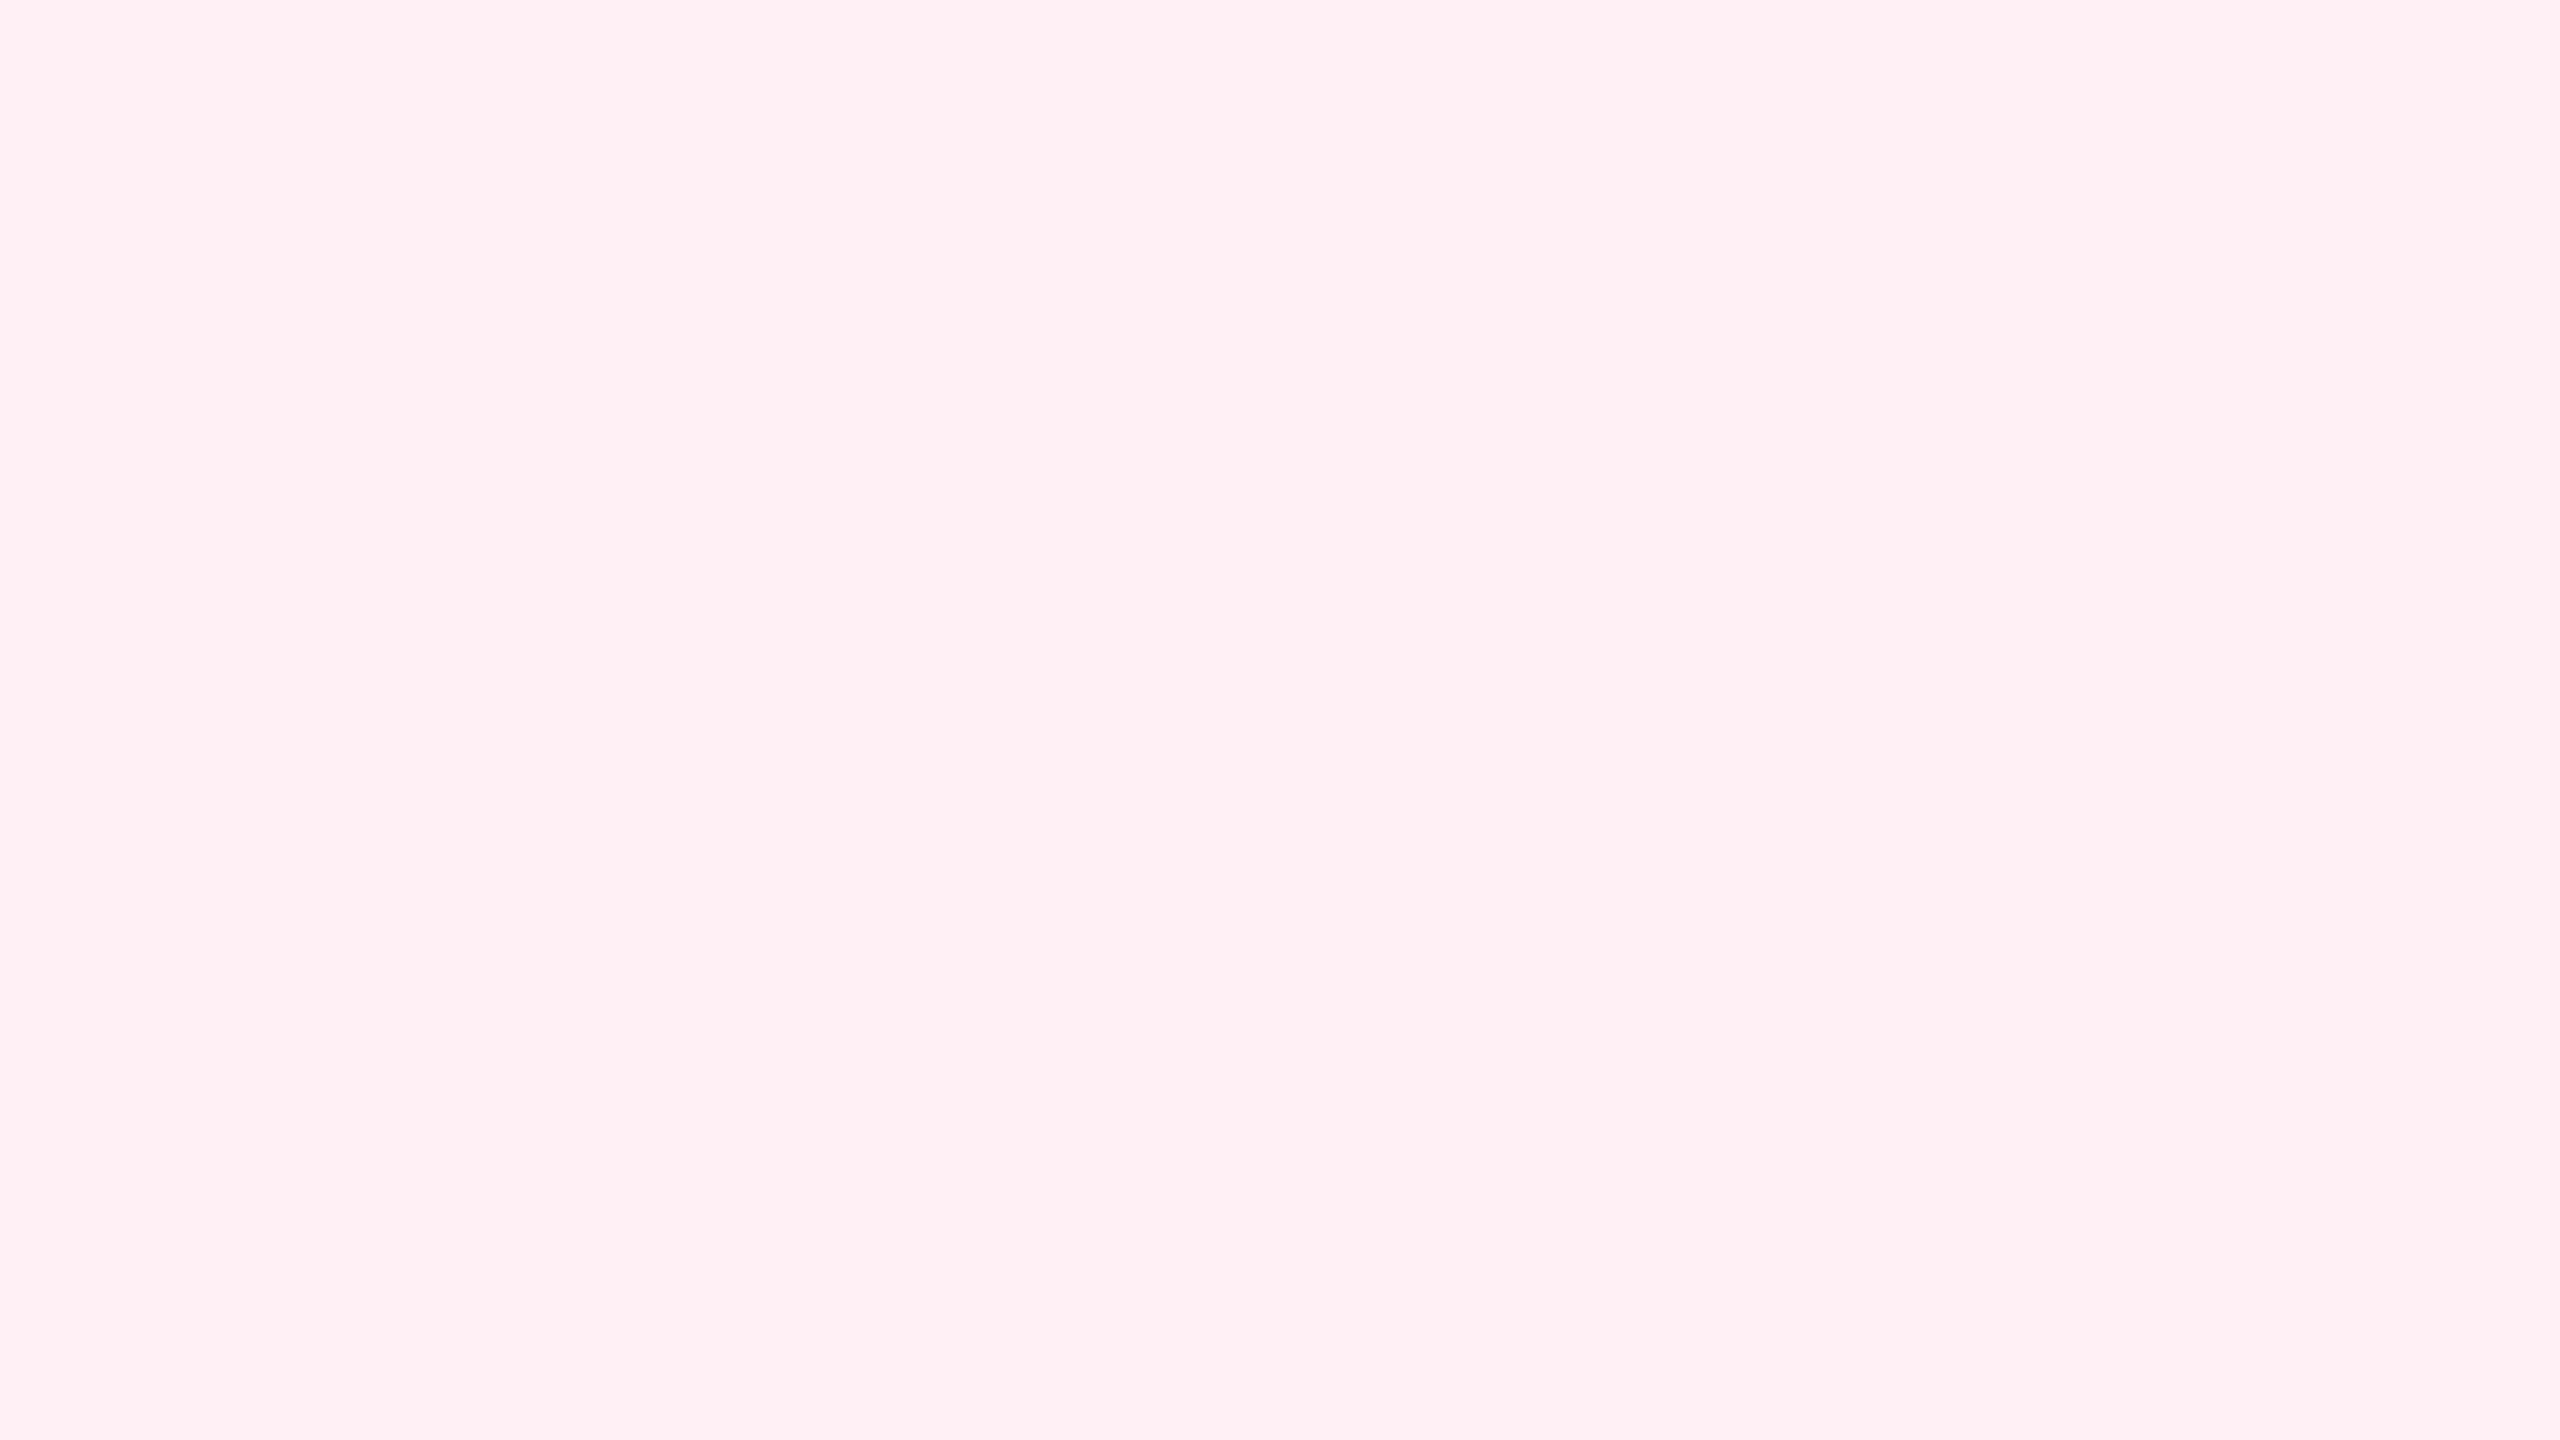 2560x1440 Lavender Blush Solid Color Background